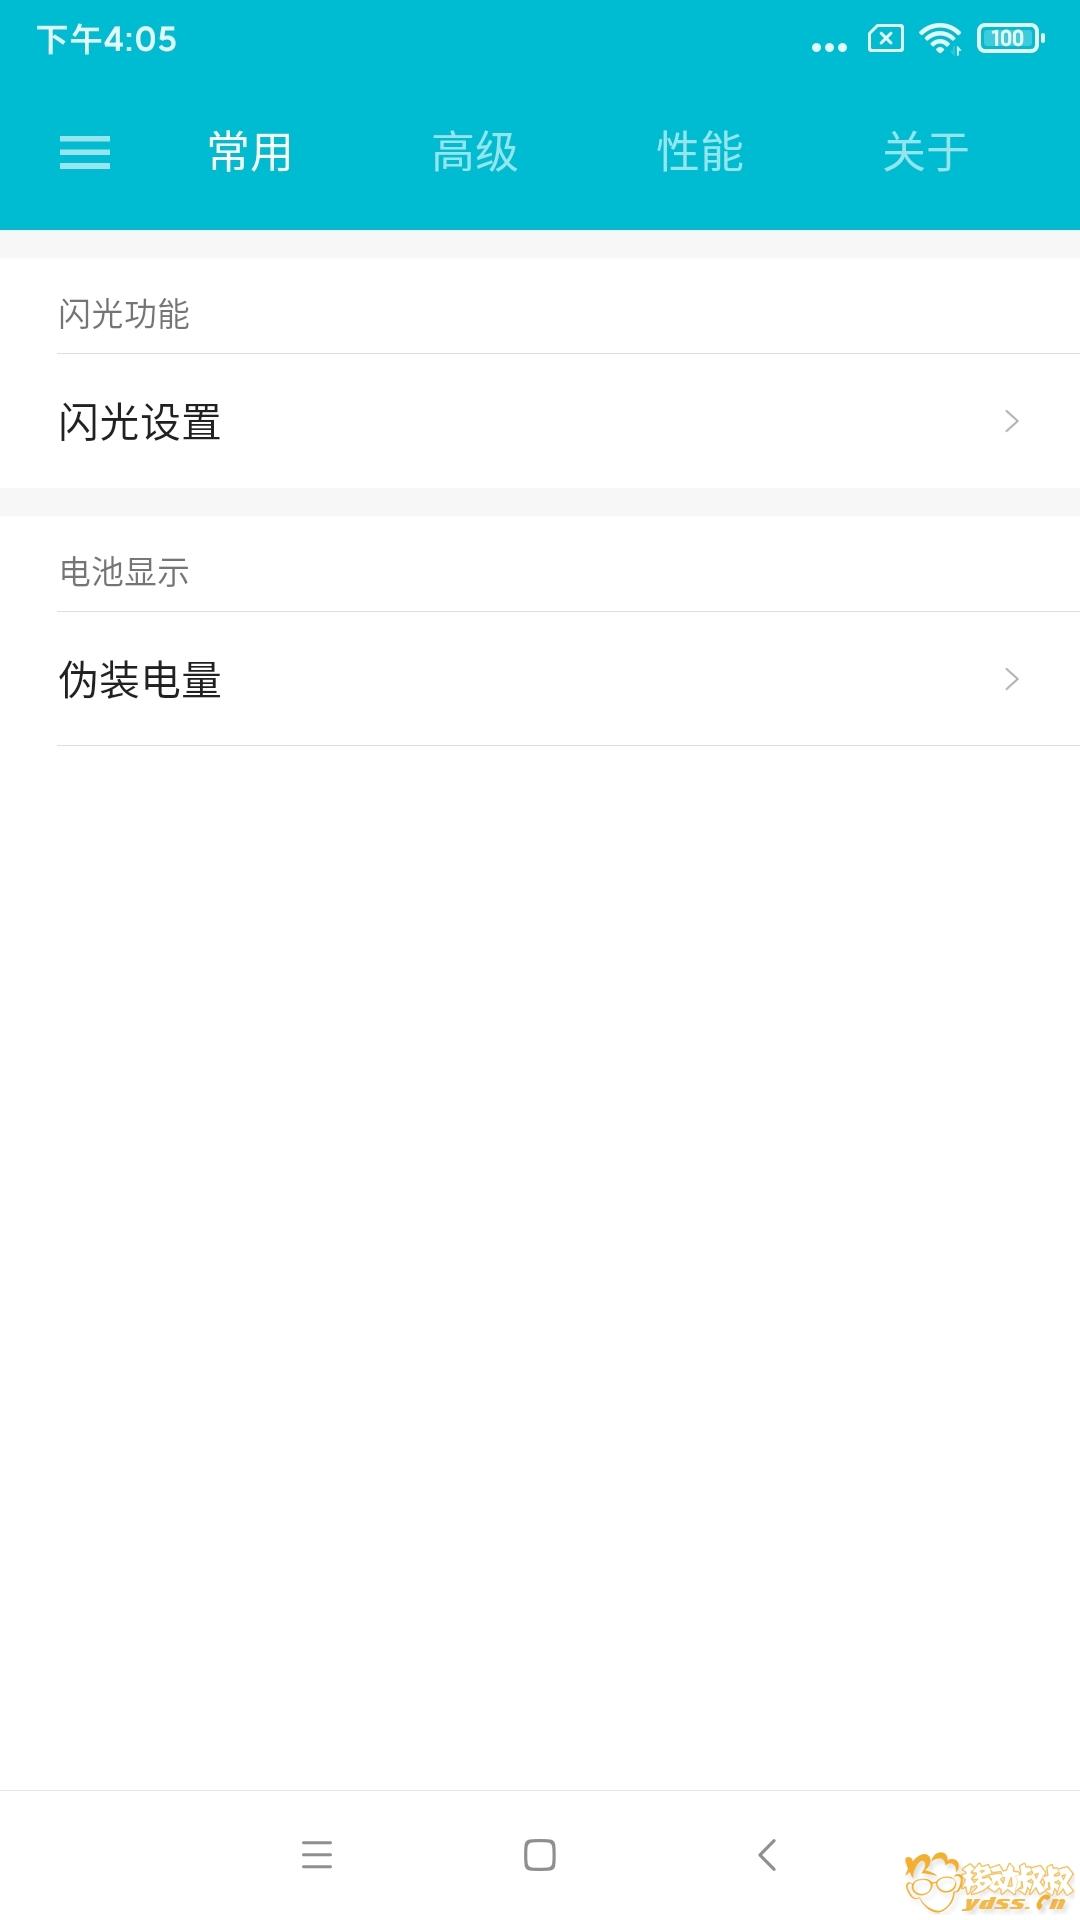 Screenshot_2019-11-16-16-05-23-795_com.ling.tools.jpg